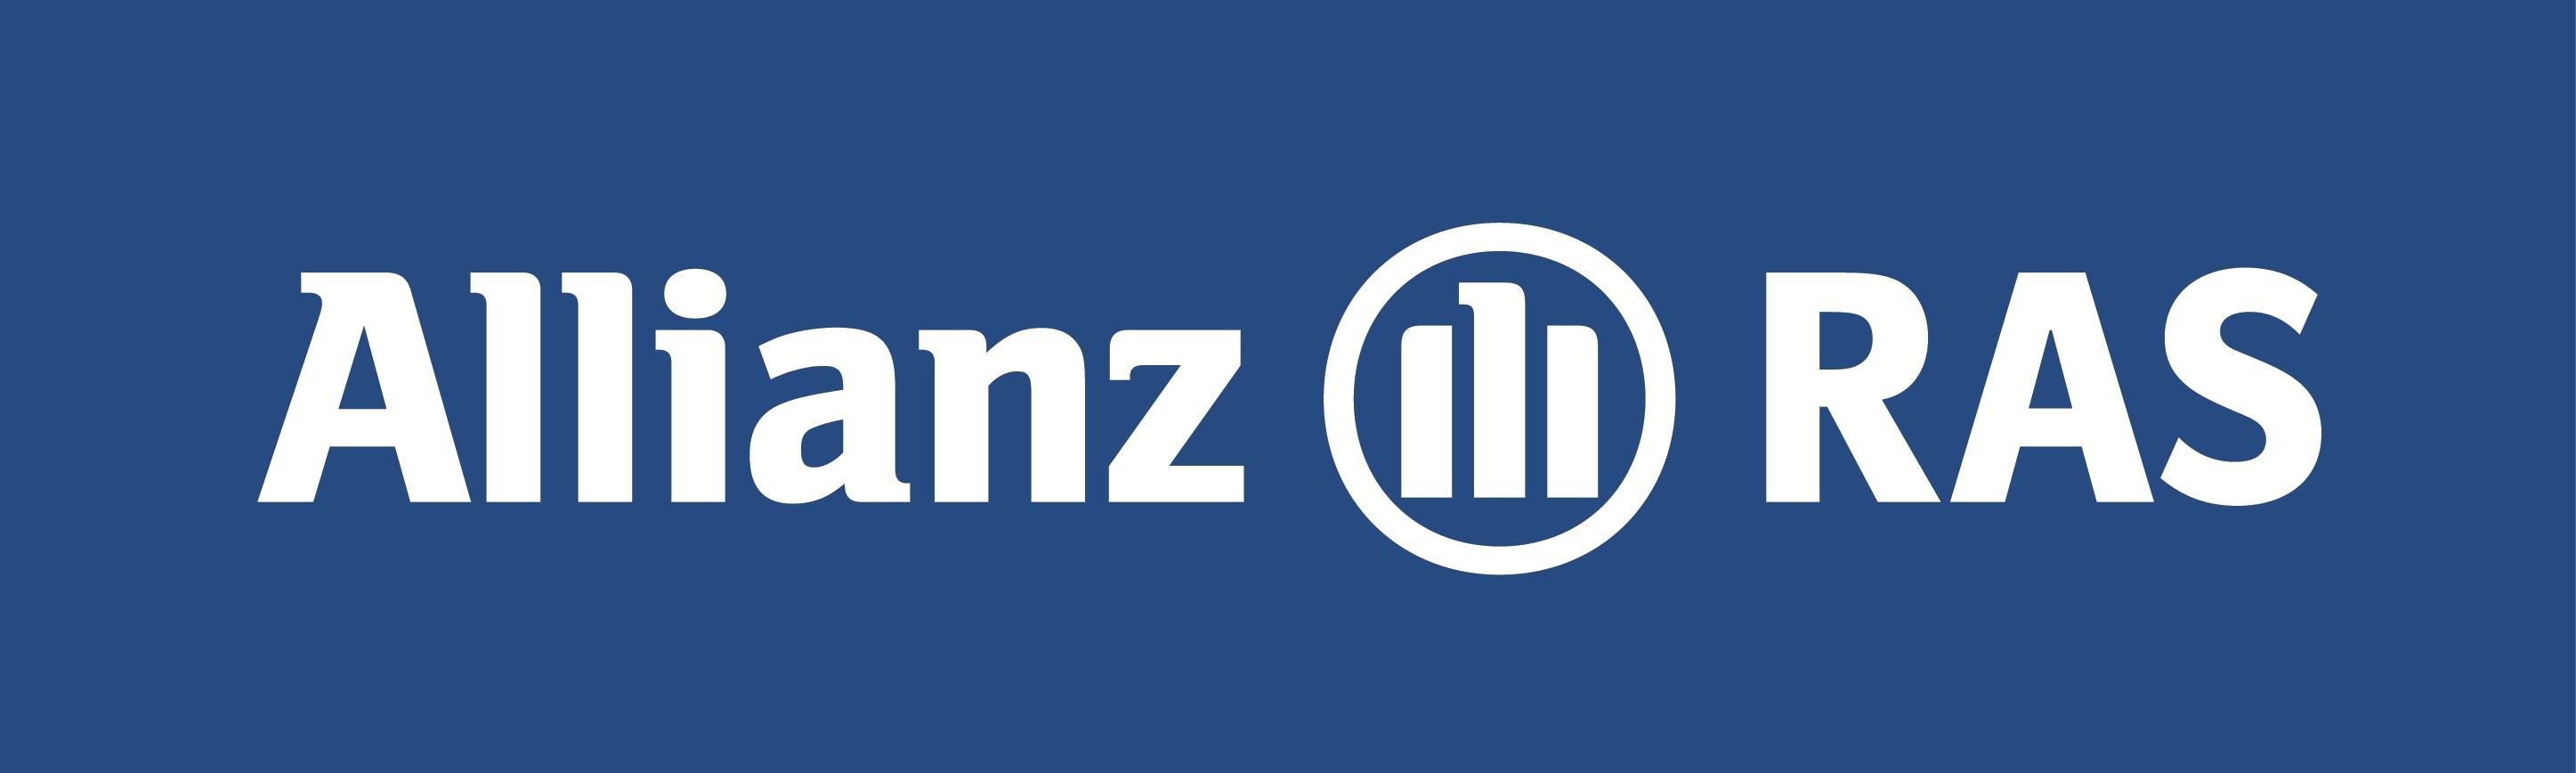 Allianz Ras assicura i rischi di impresa